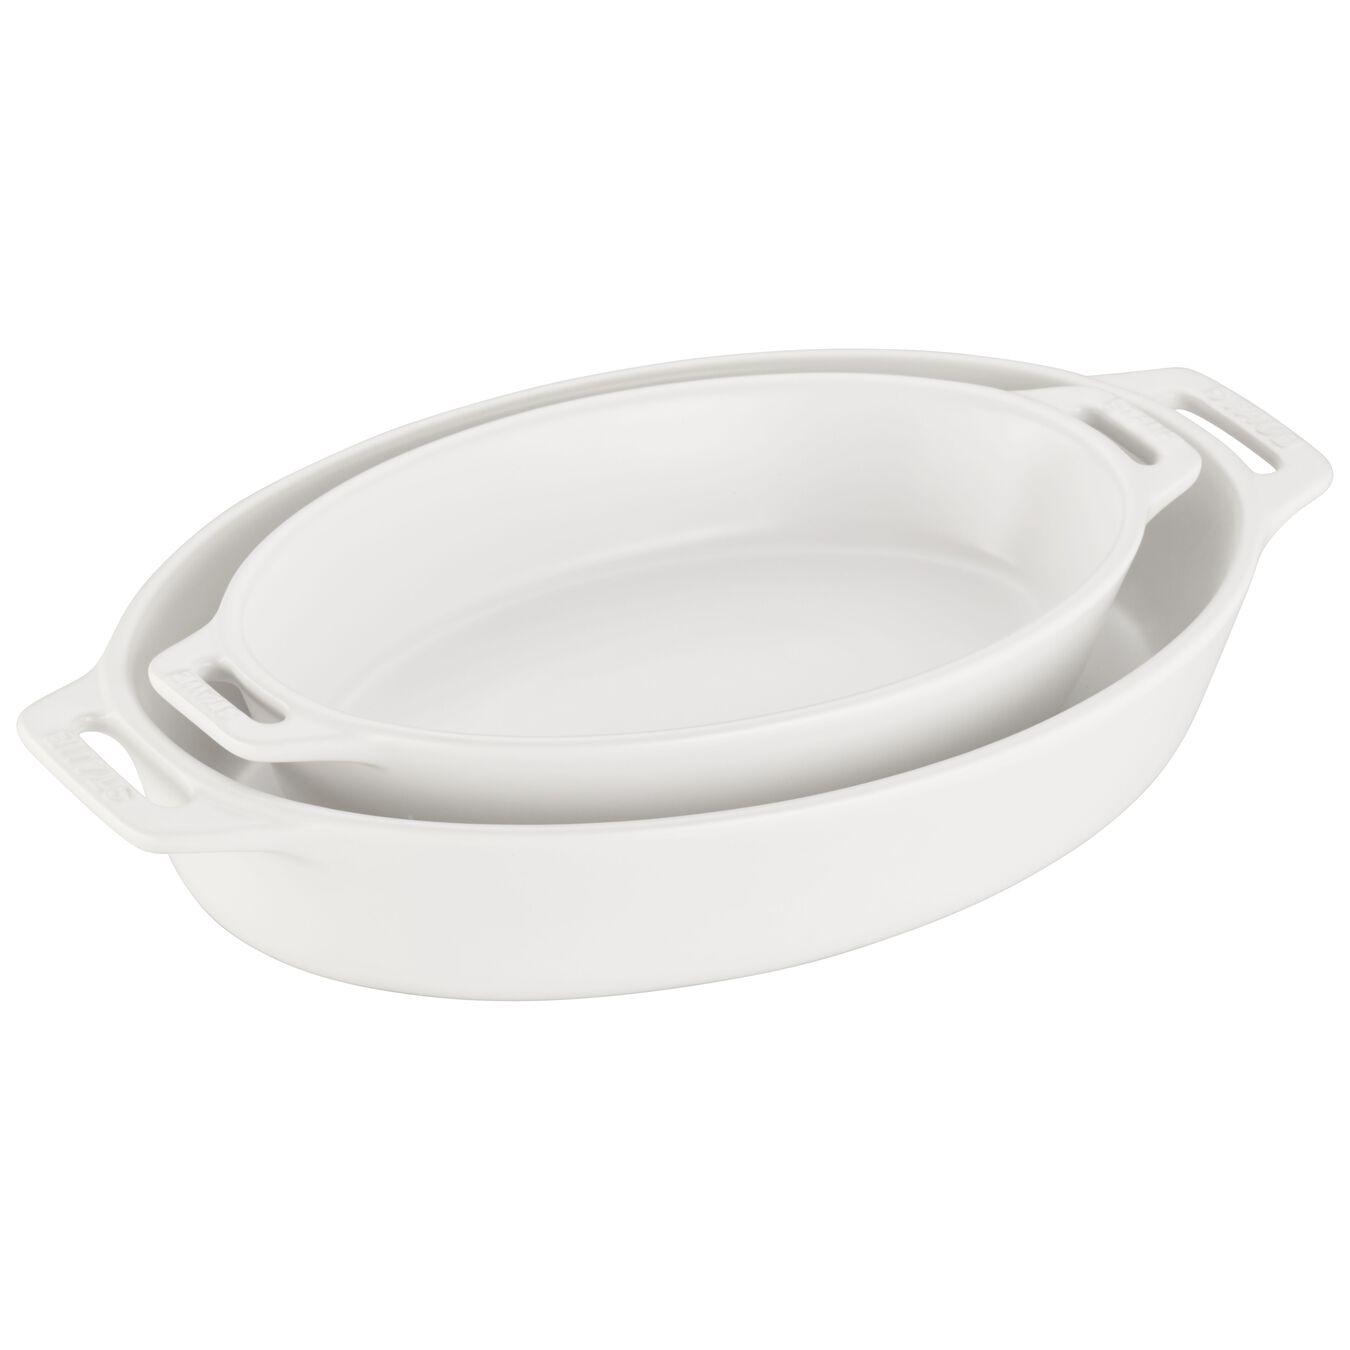 2 Piece oval Bakeware set, Matte-White,,large 1